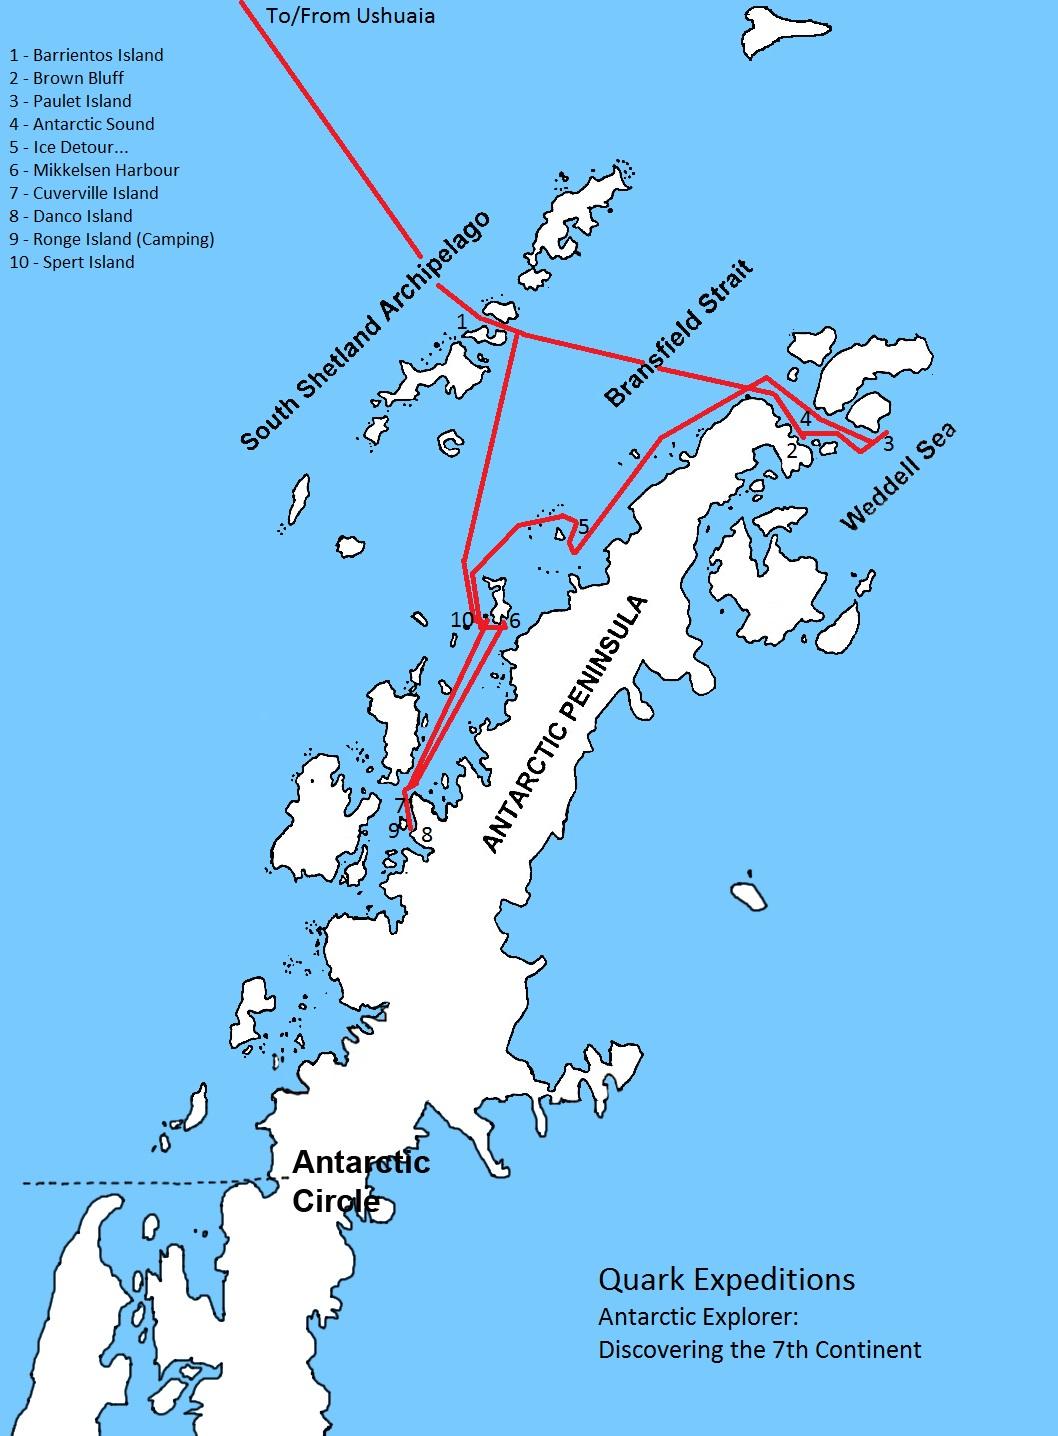 Peninsula details - courtesy of Quark Expeditions.